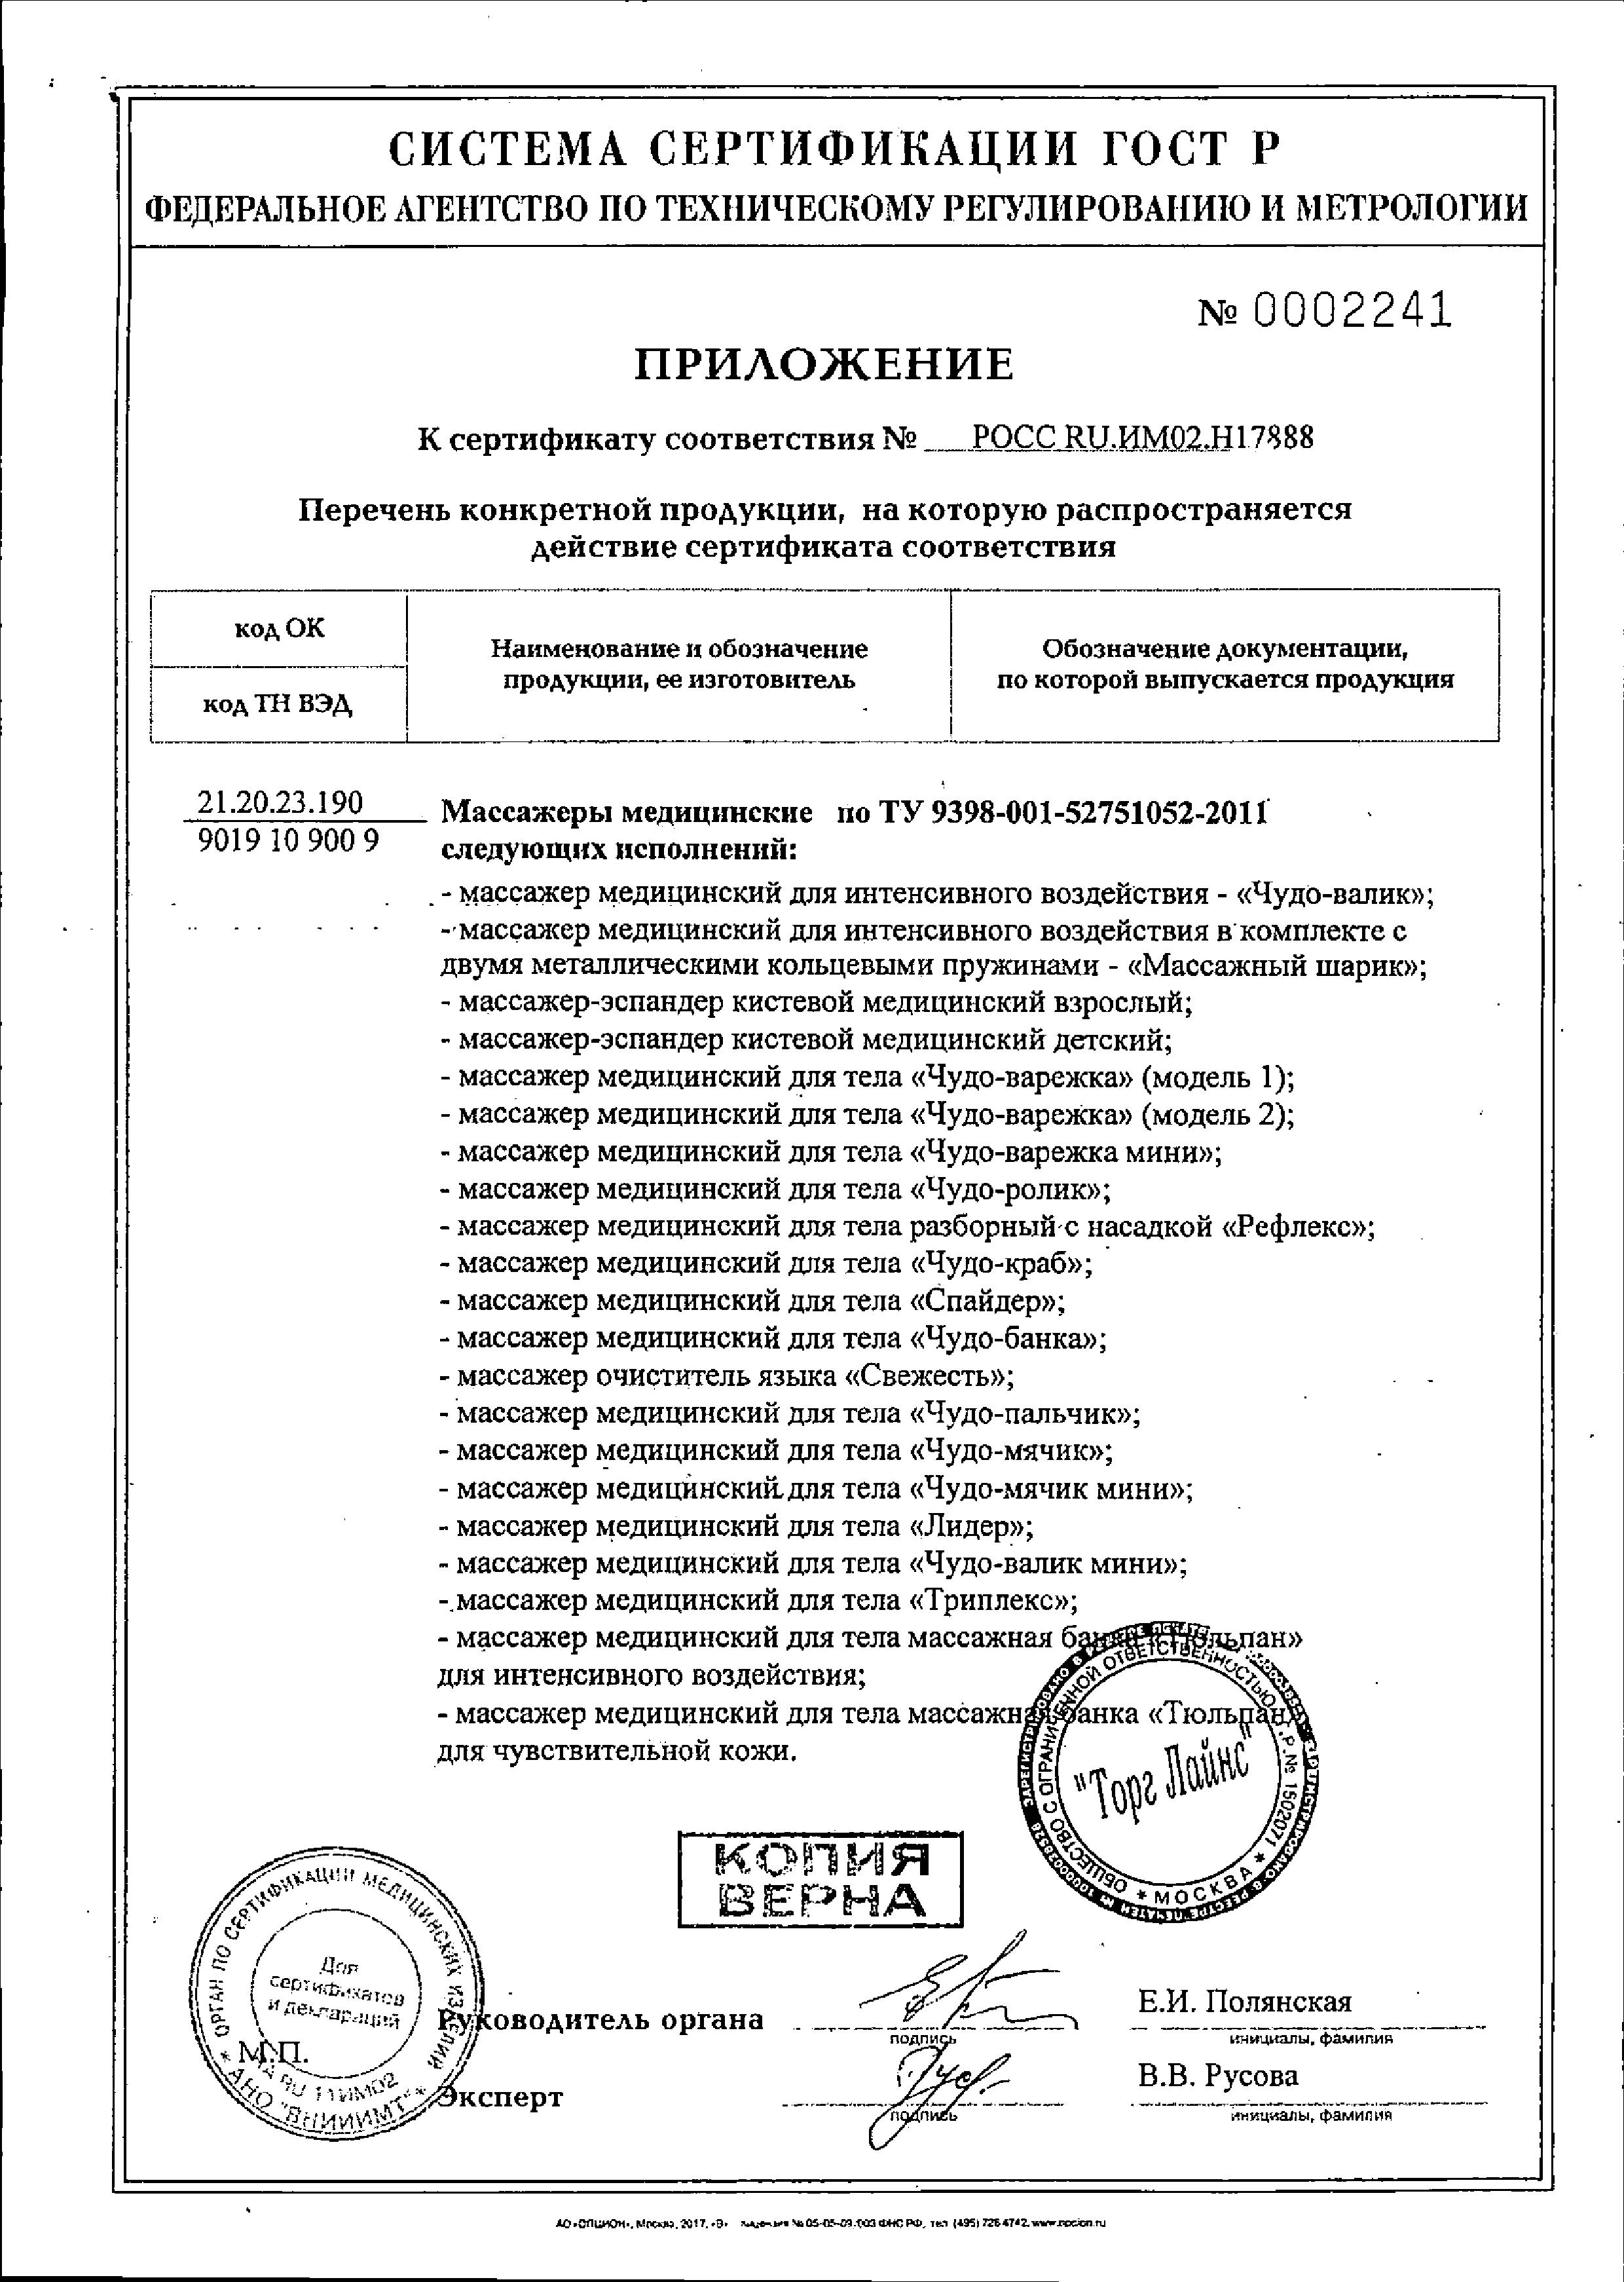 Чудо-банка массажер медицинский для тела сертификат